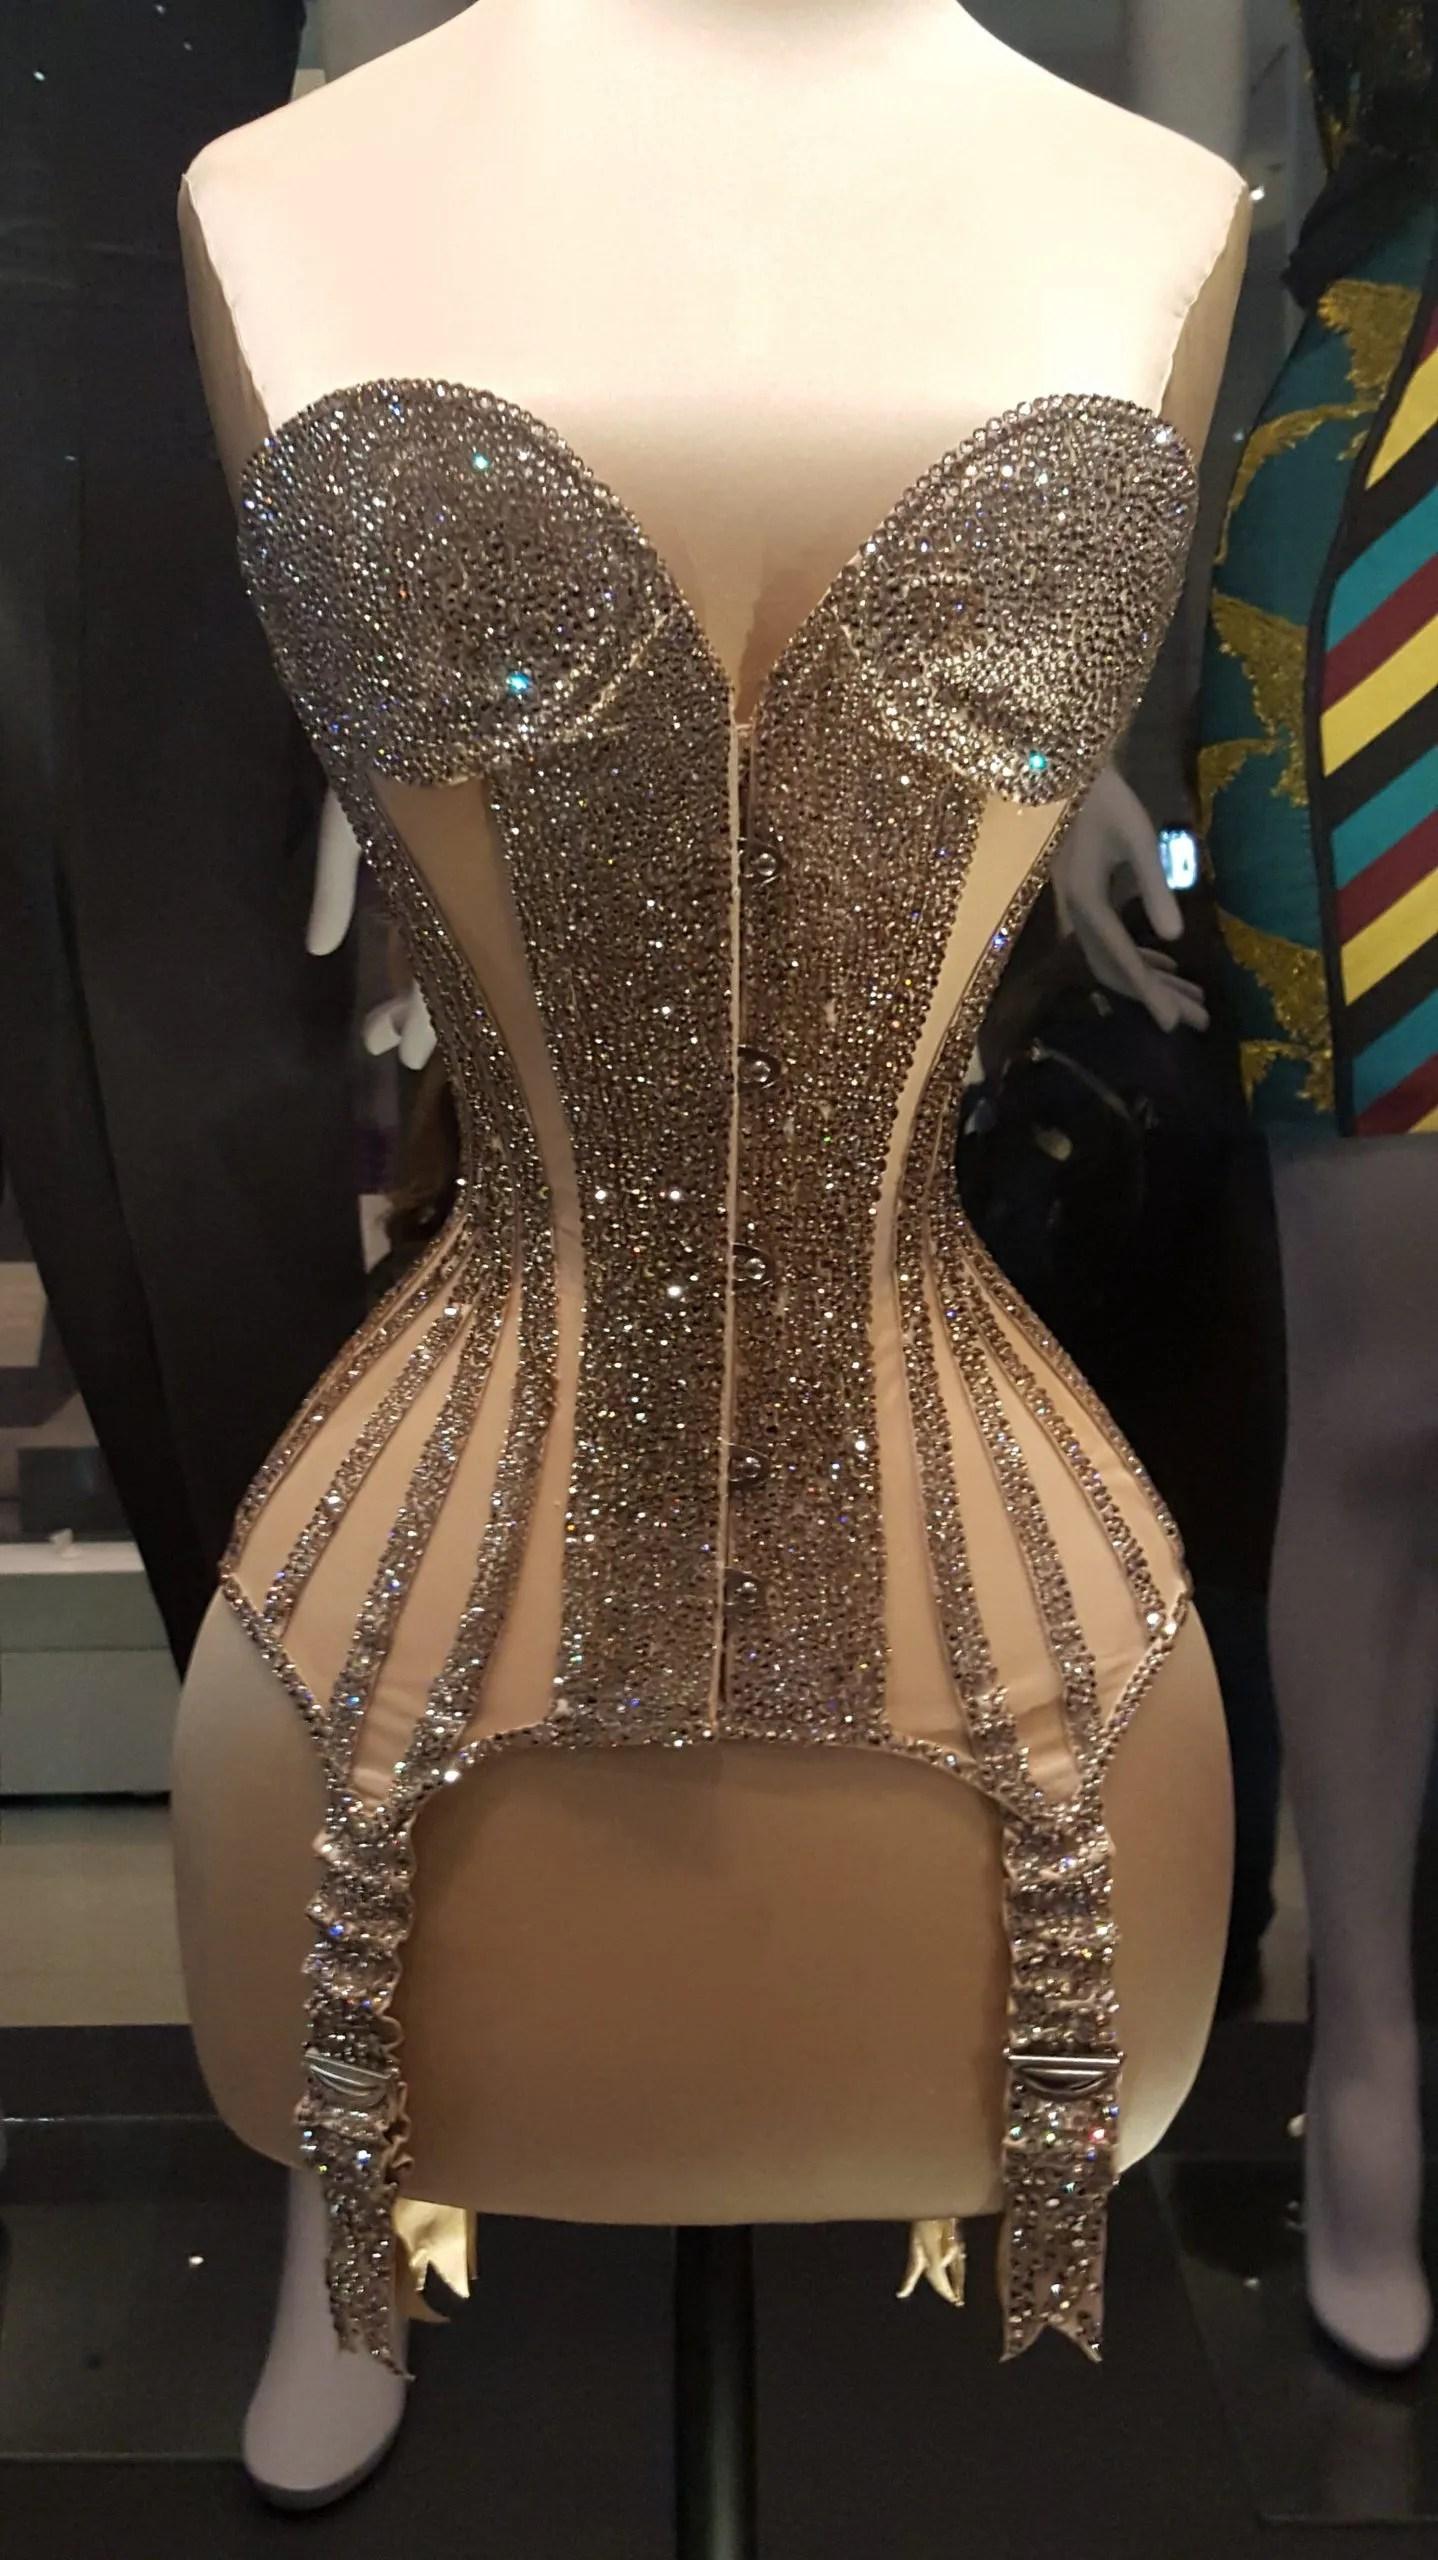 Dita_von_Teese corset Undressed